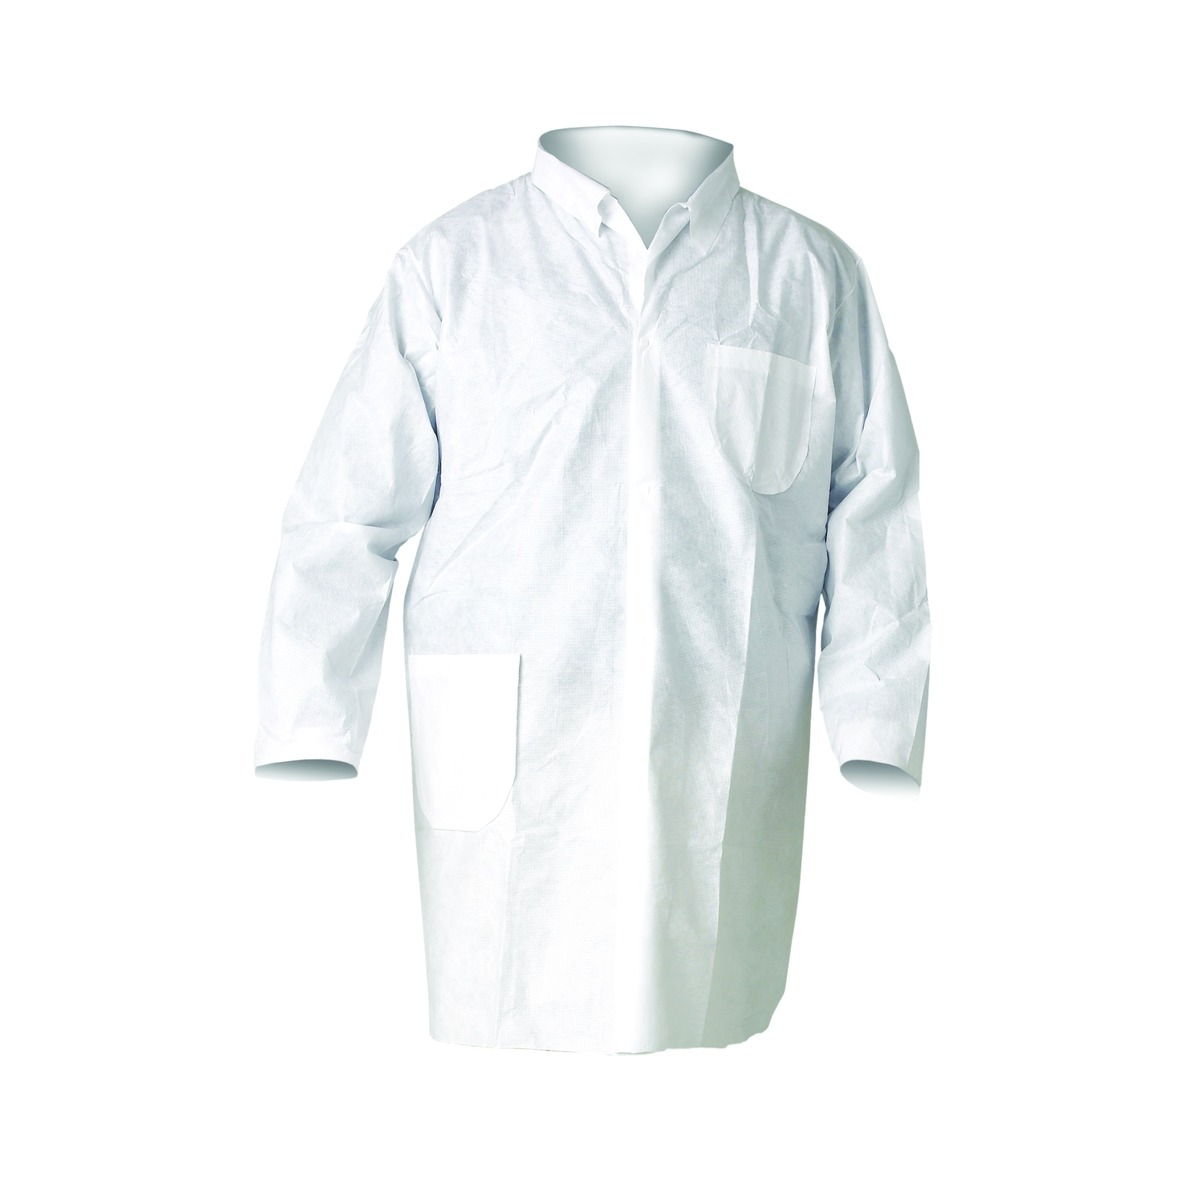 Disposable lab coat, x-large